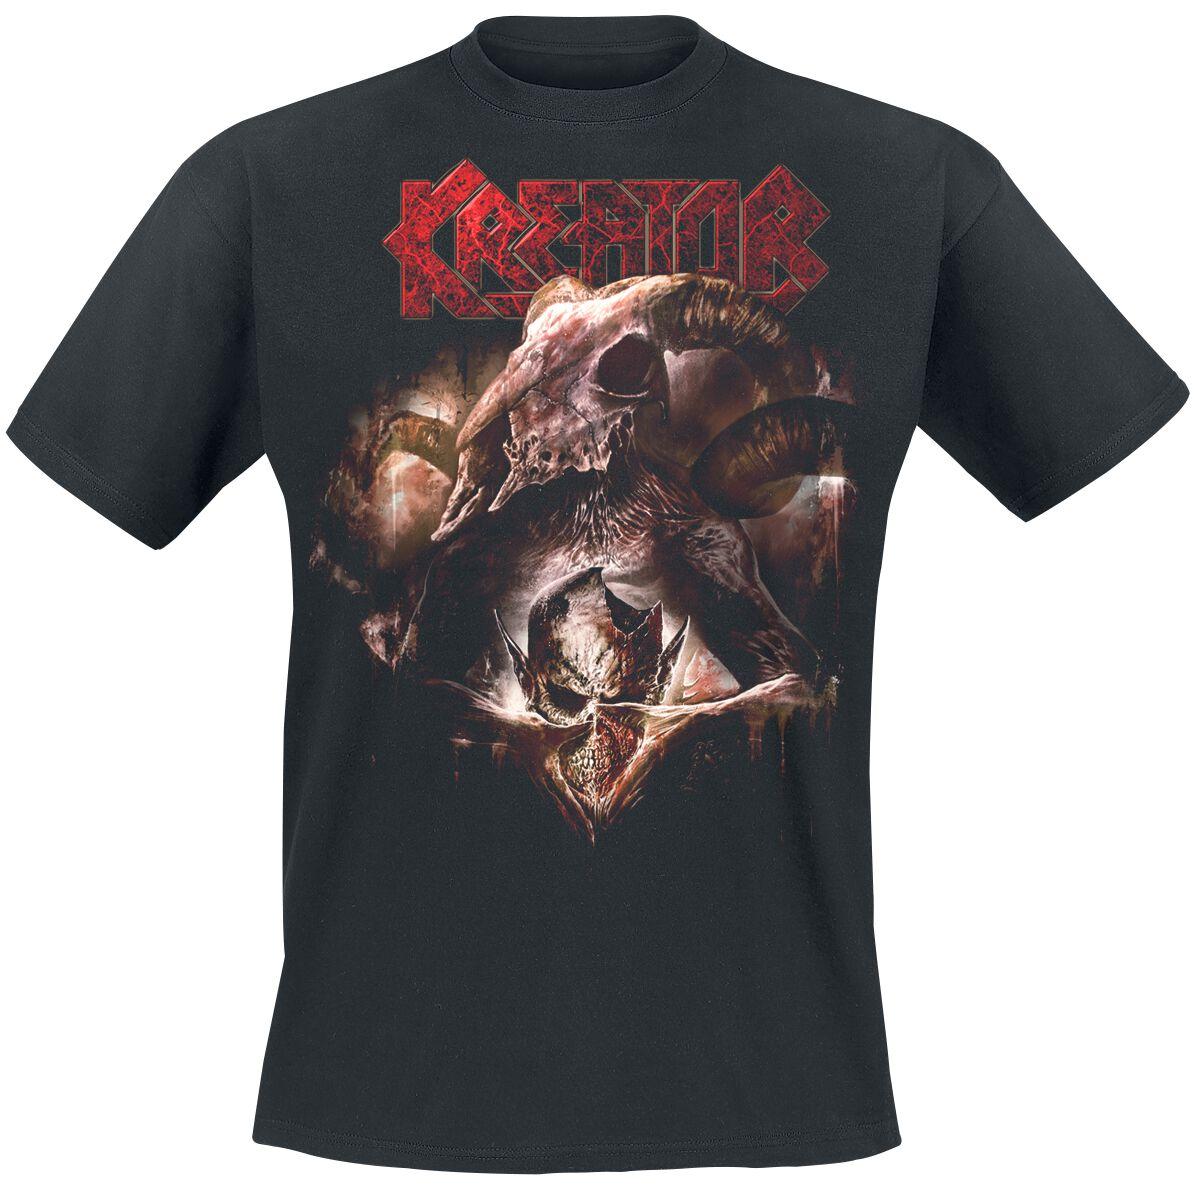 Zespoły - Koszulki - T-Shirt Kreator Gods Of Violence Tracklist T-Shirt czarny - 346712